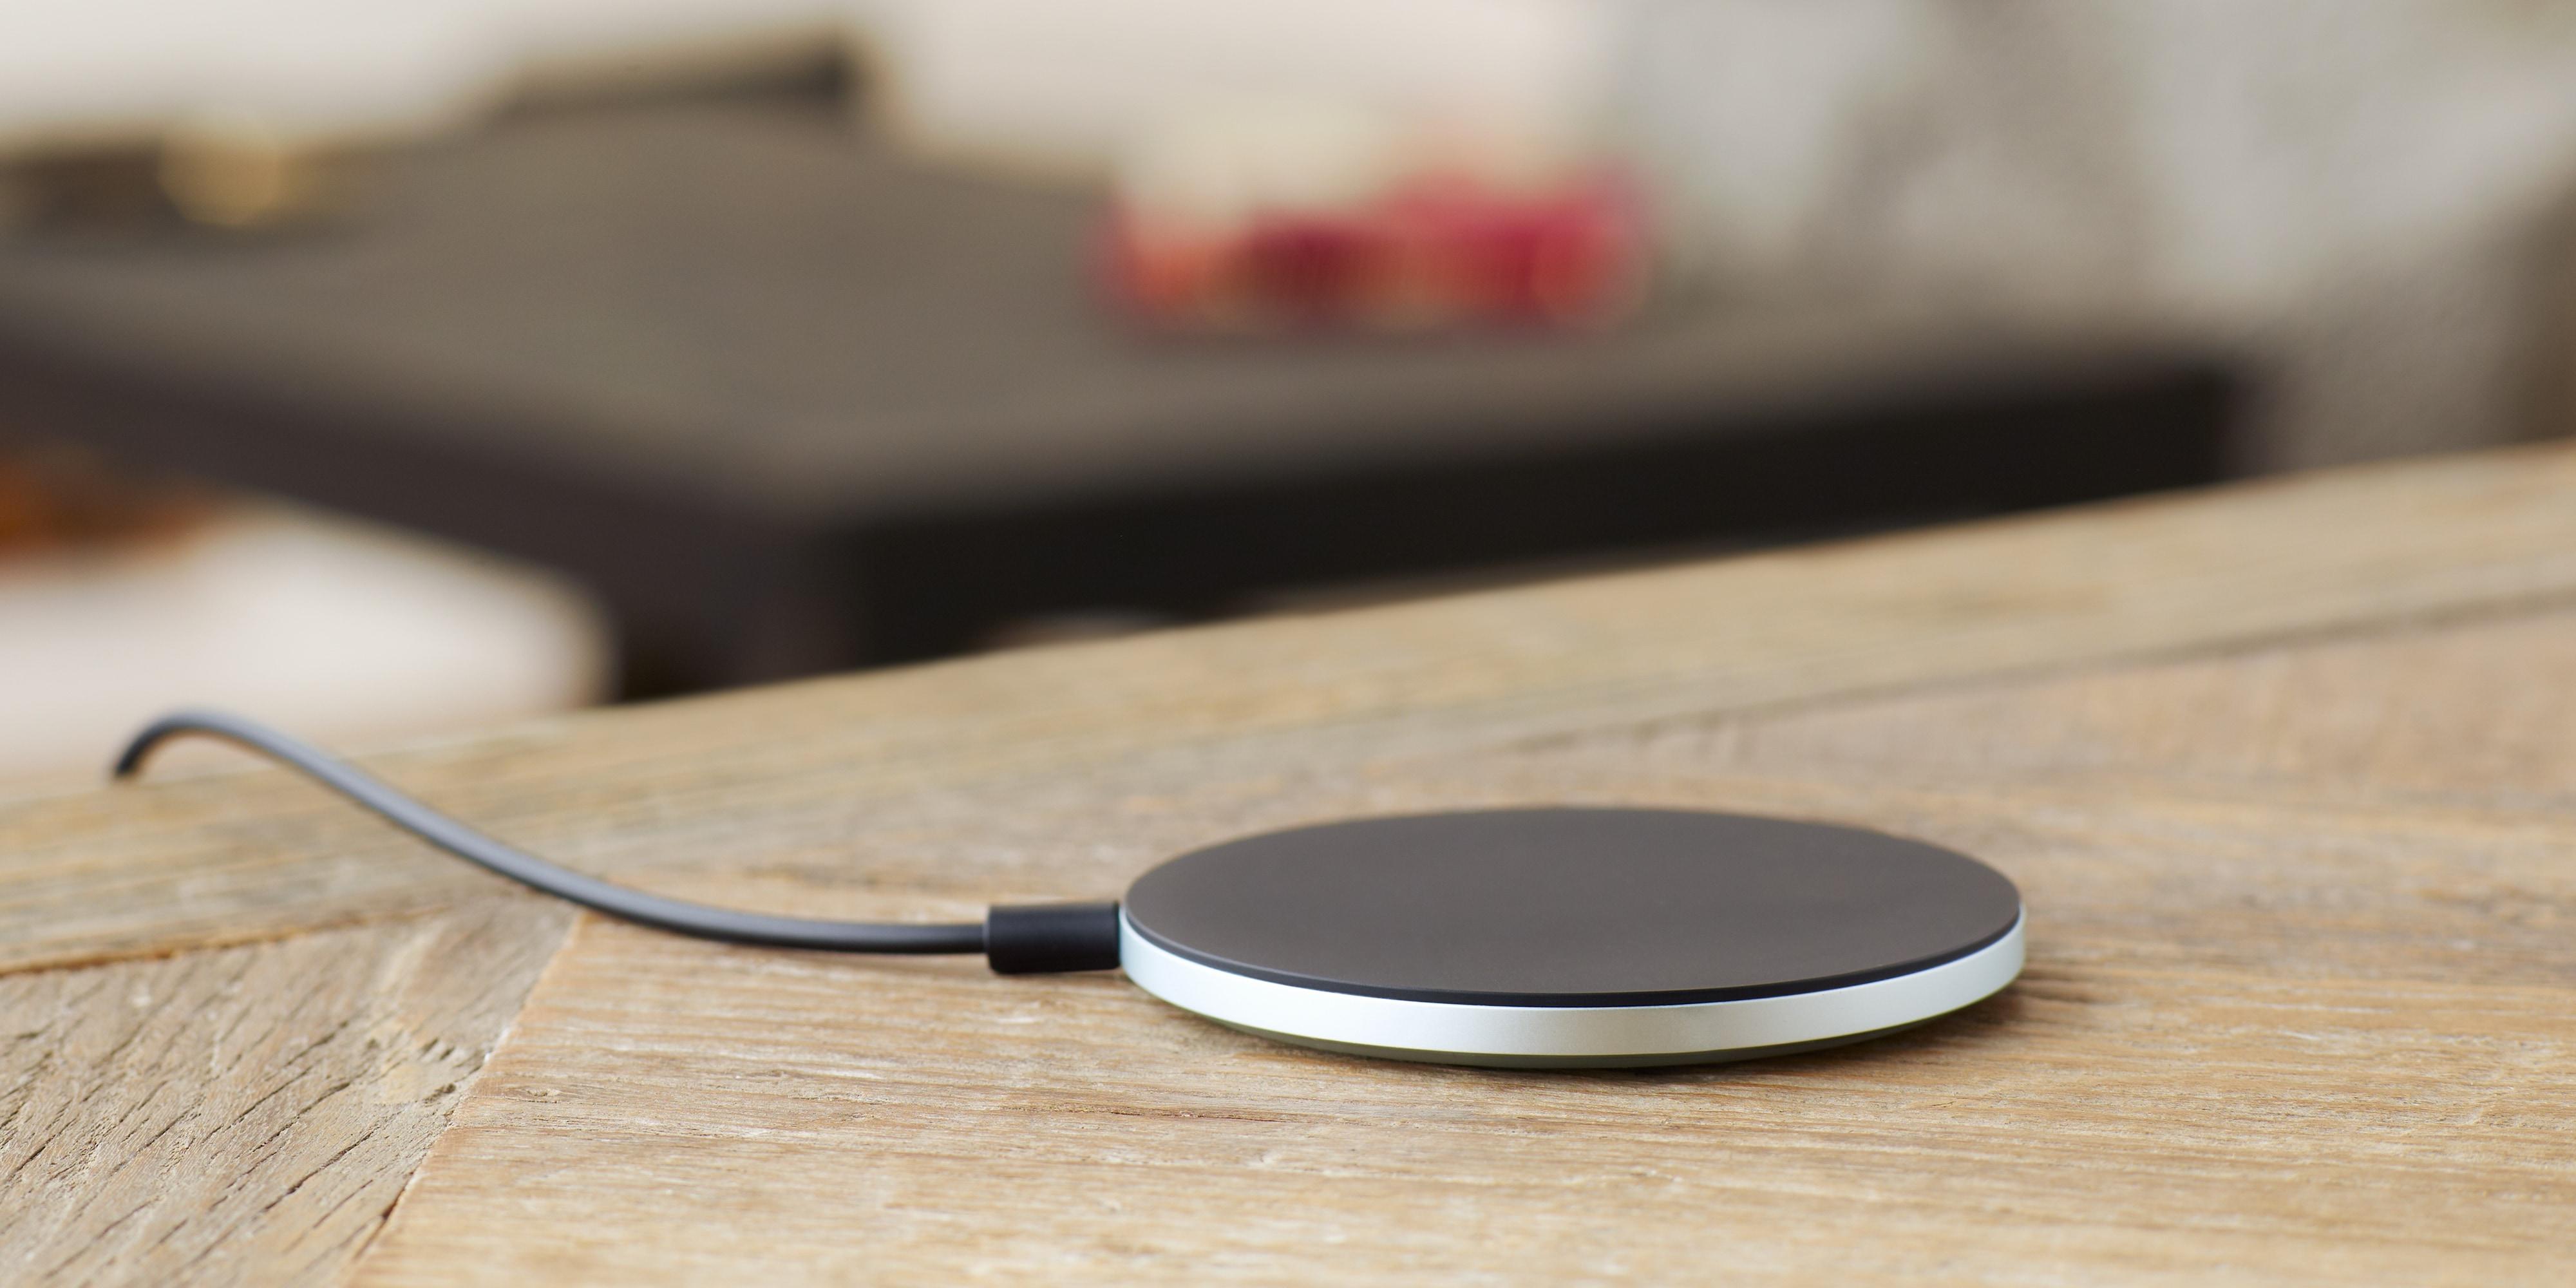 Sony-Wireless-Charging-Plate-WCH10_3